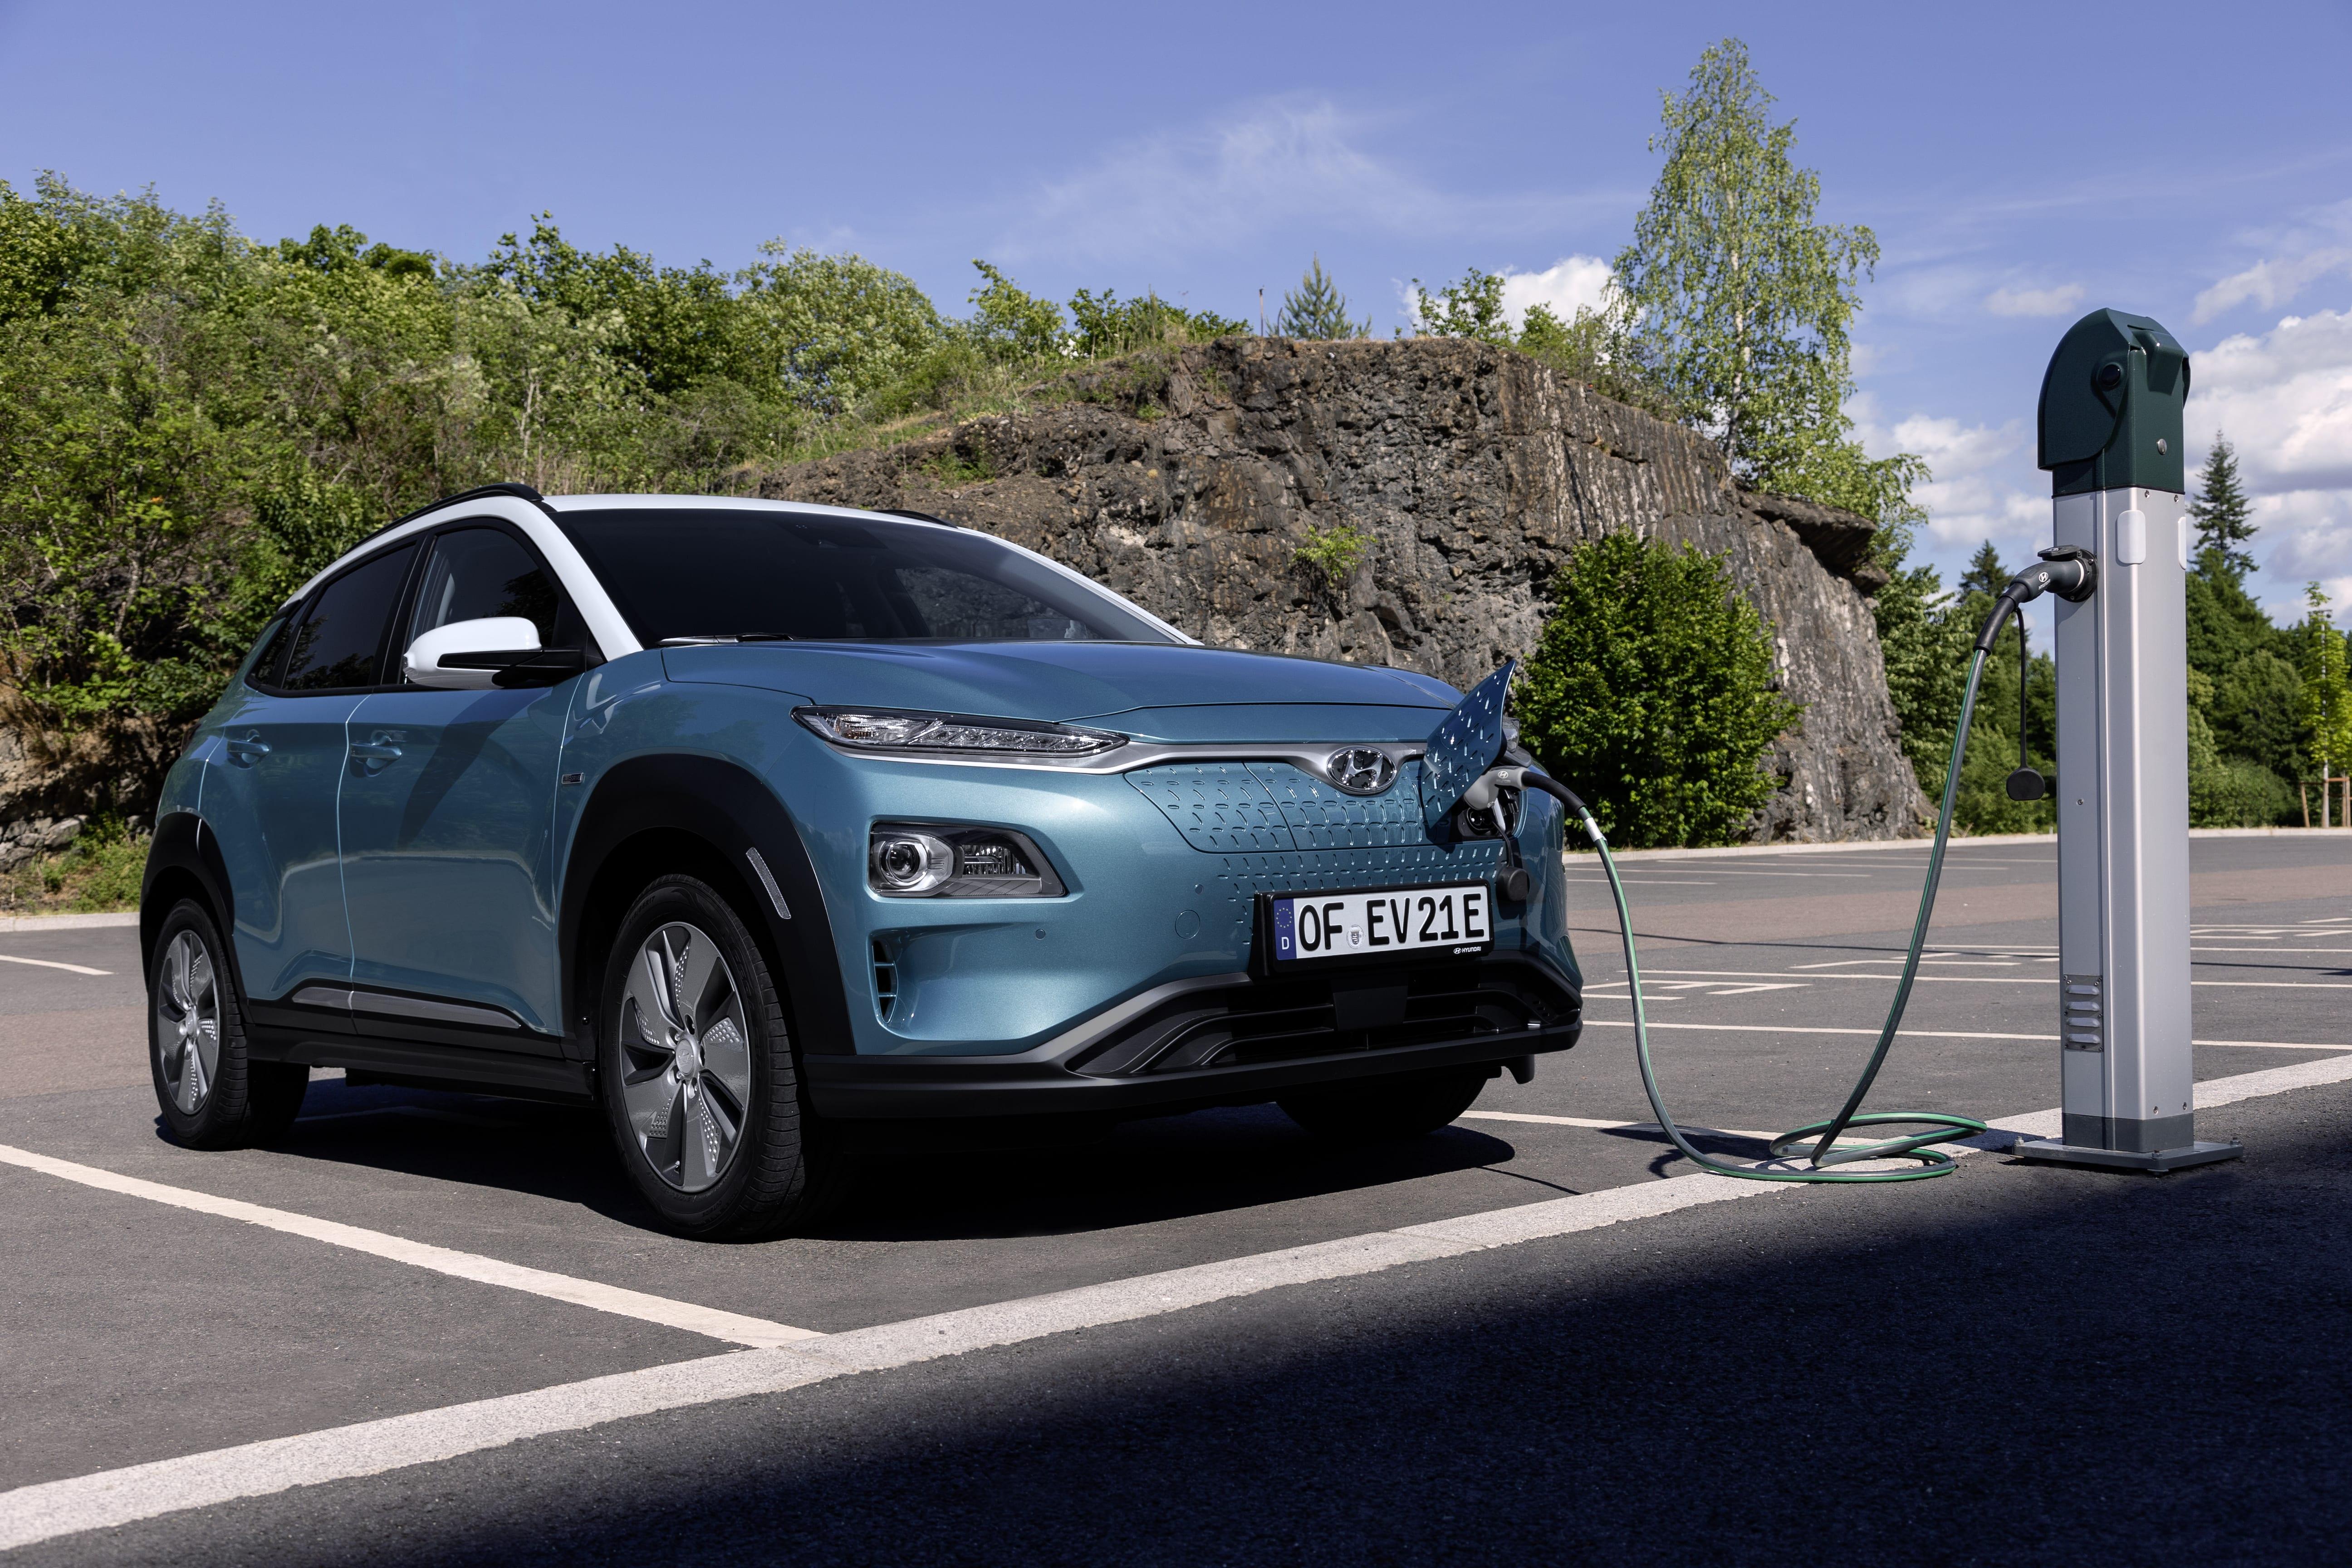 Hyundai-KONA-Electric-vitez-ankety-Zelene-auto-roku-2018-1